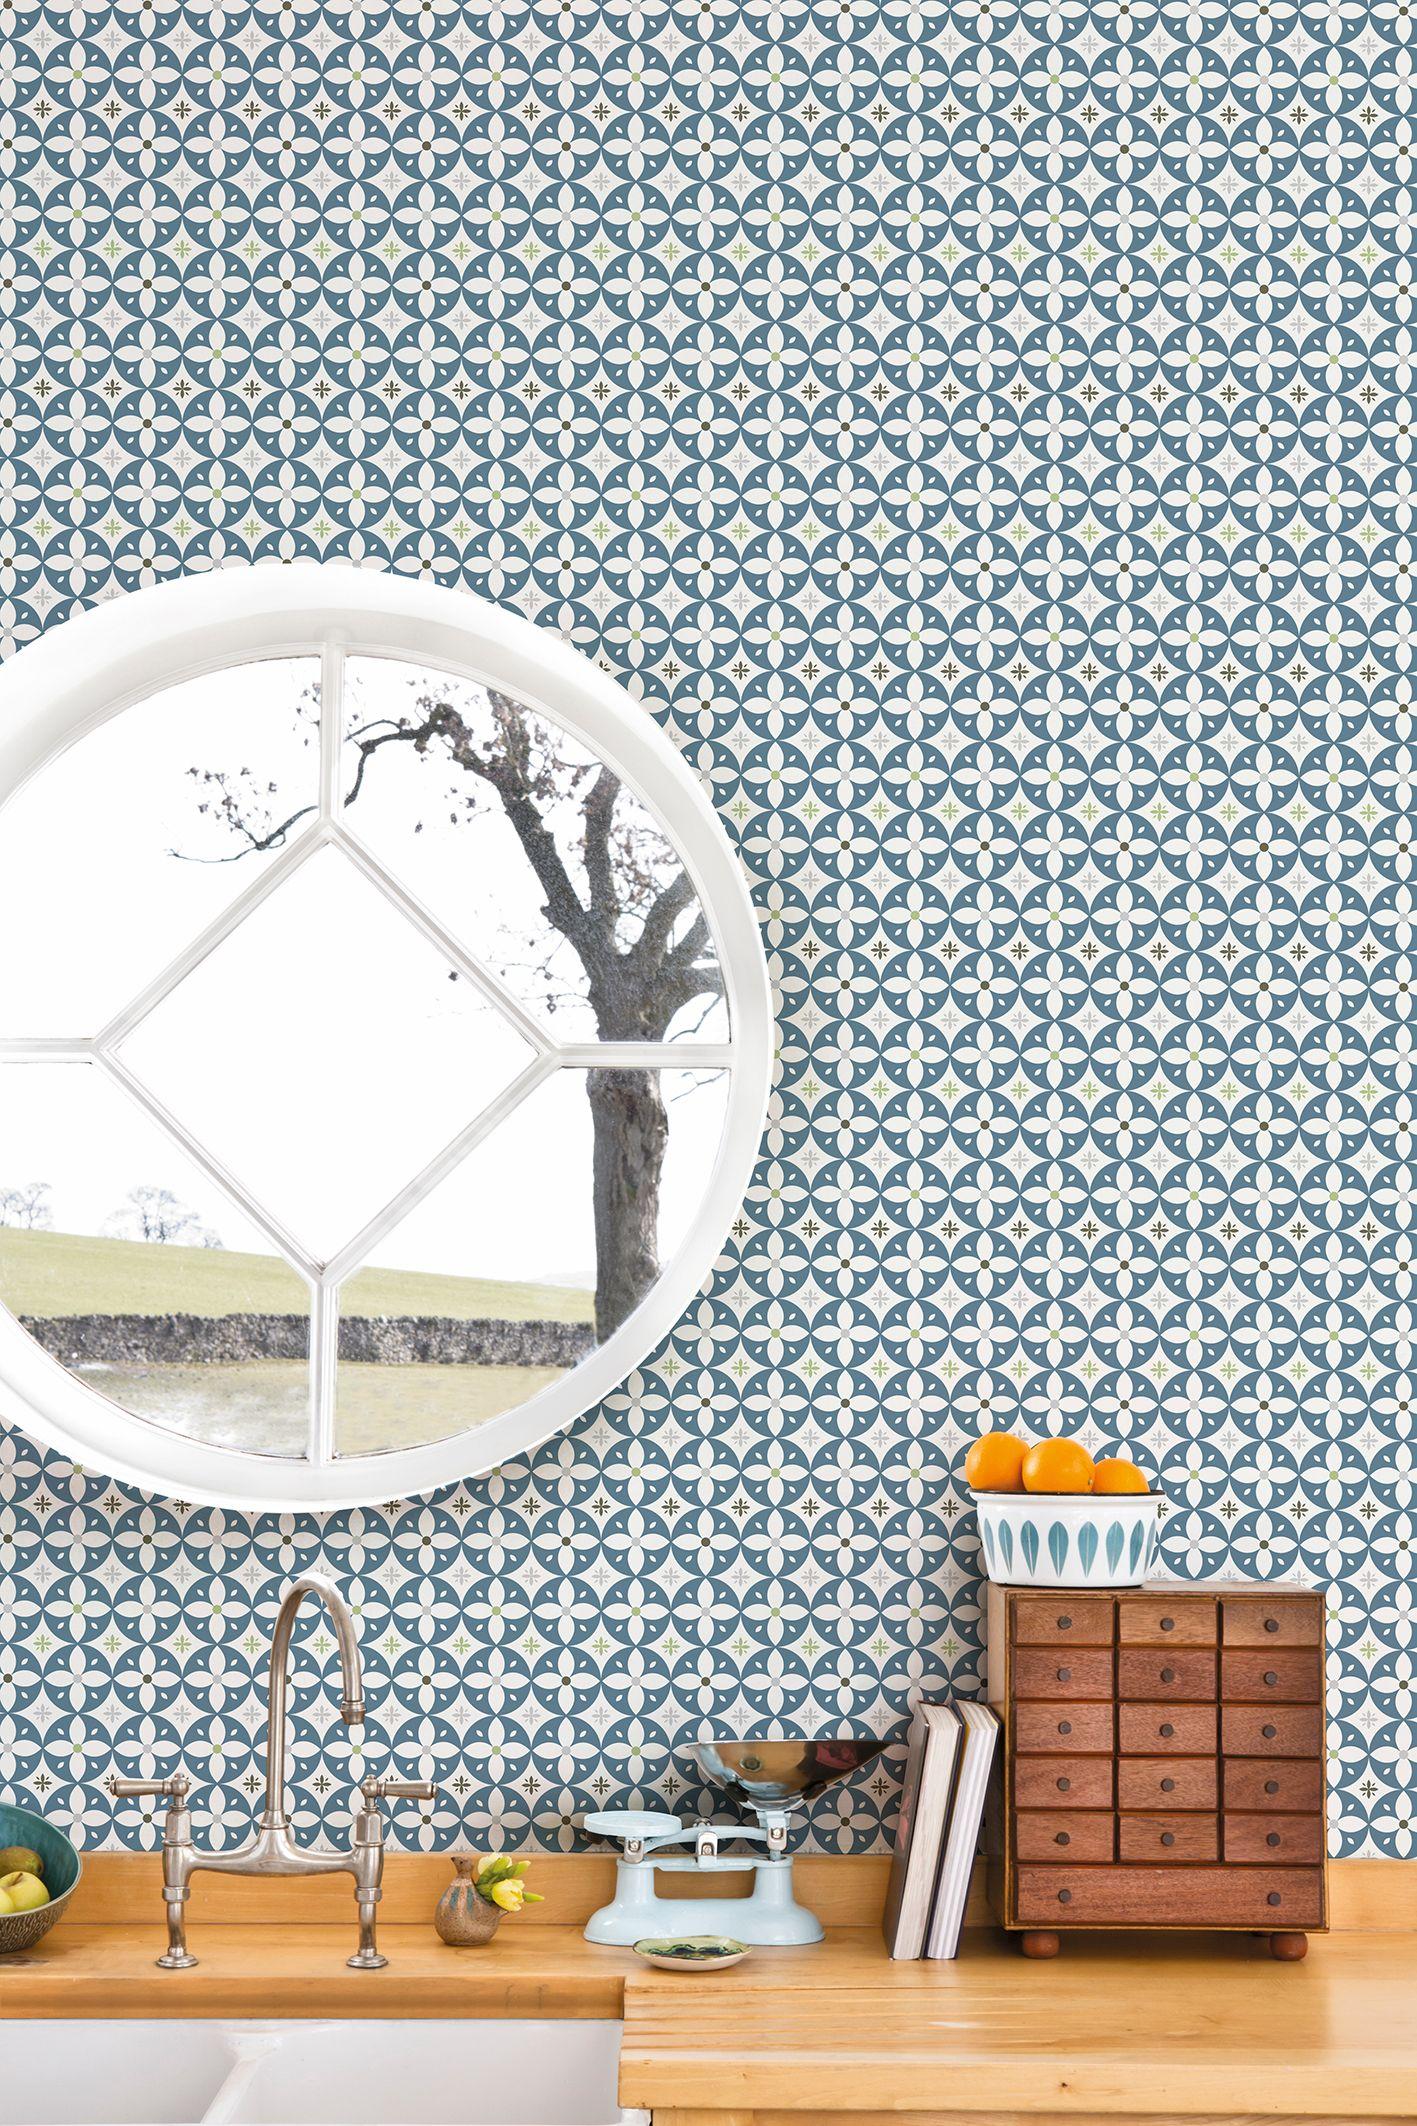 sweet home wallpaper designs. Flower Breeze wallpaper from Layla Faye www laylafaye com Retro modern and  mid century